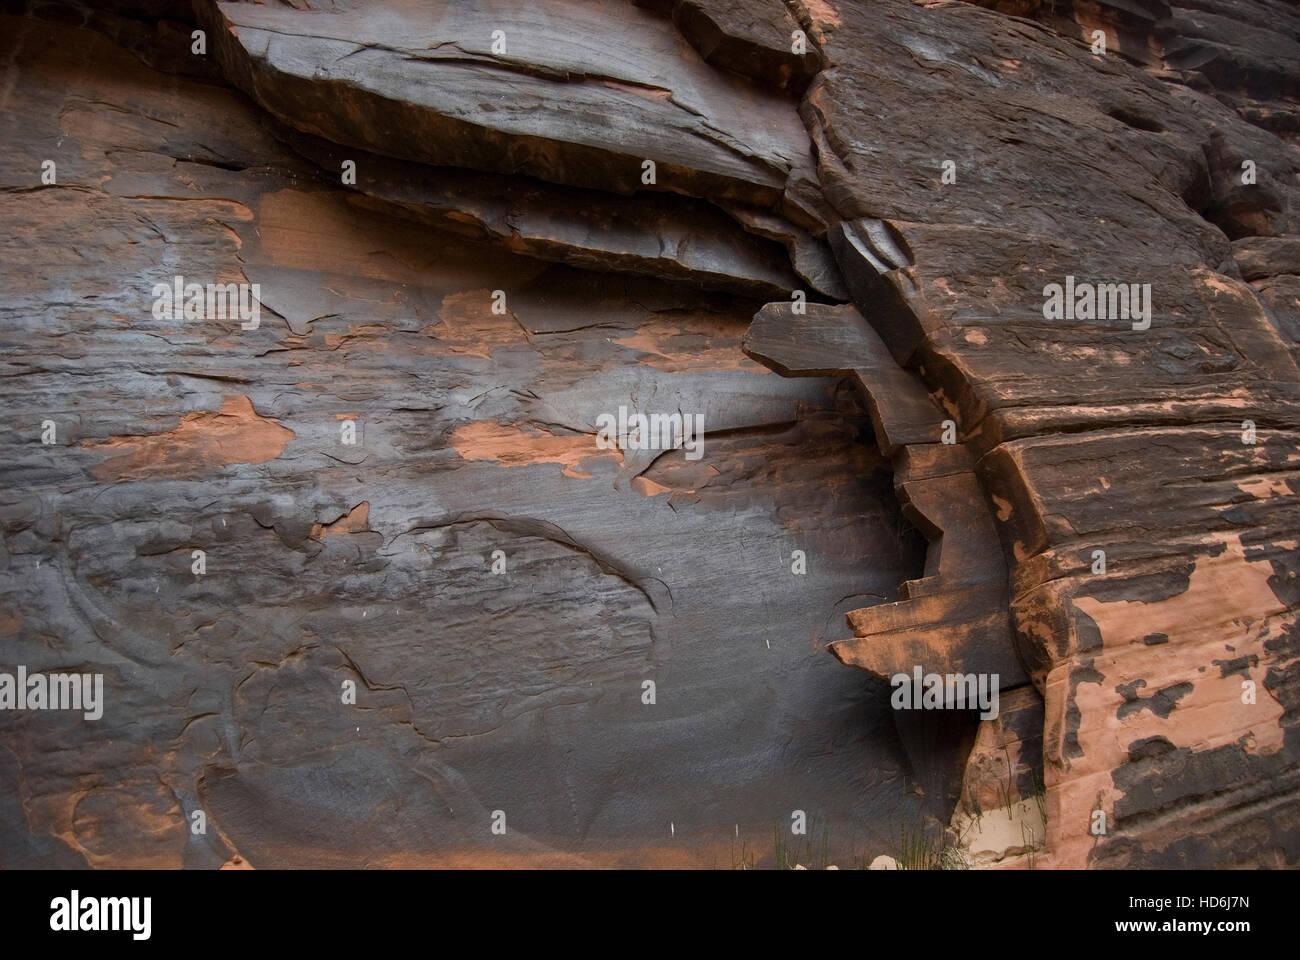 Unusual sandstone outcrop with desert varnish (manganese oxide) coating. Grand Canyon National Park, Arizona, USA. - Stock Image